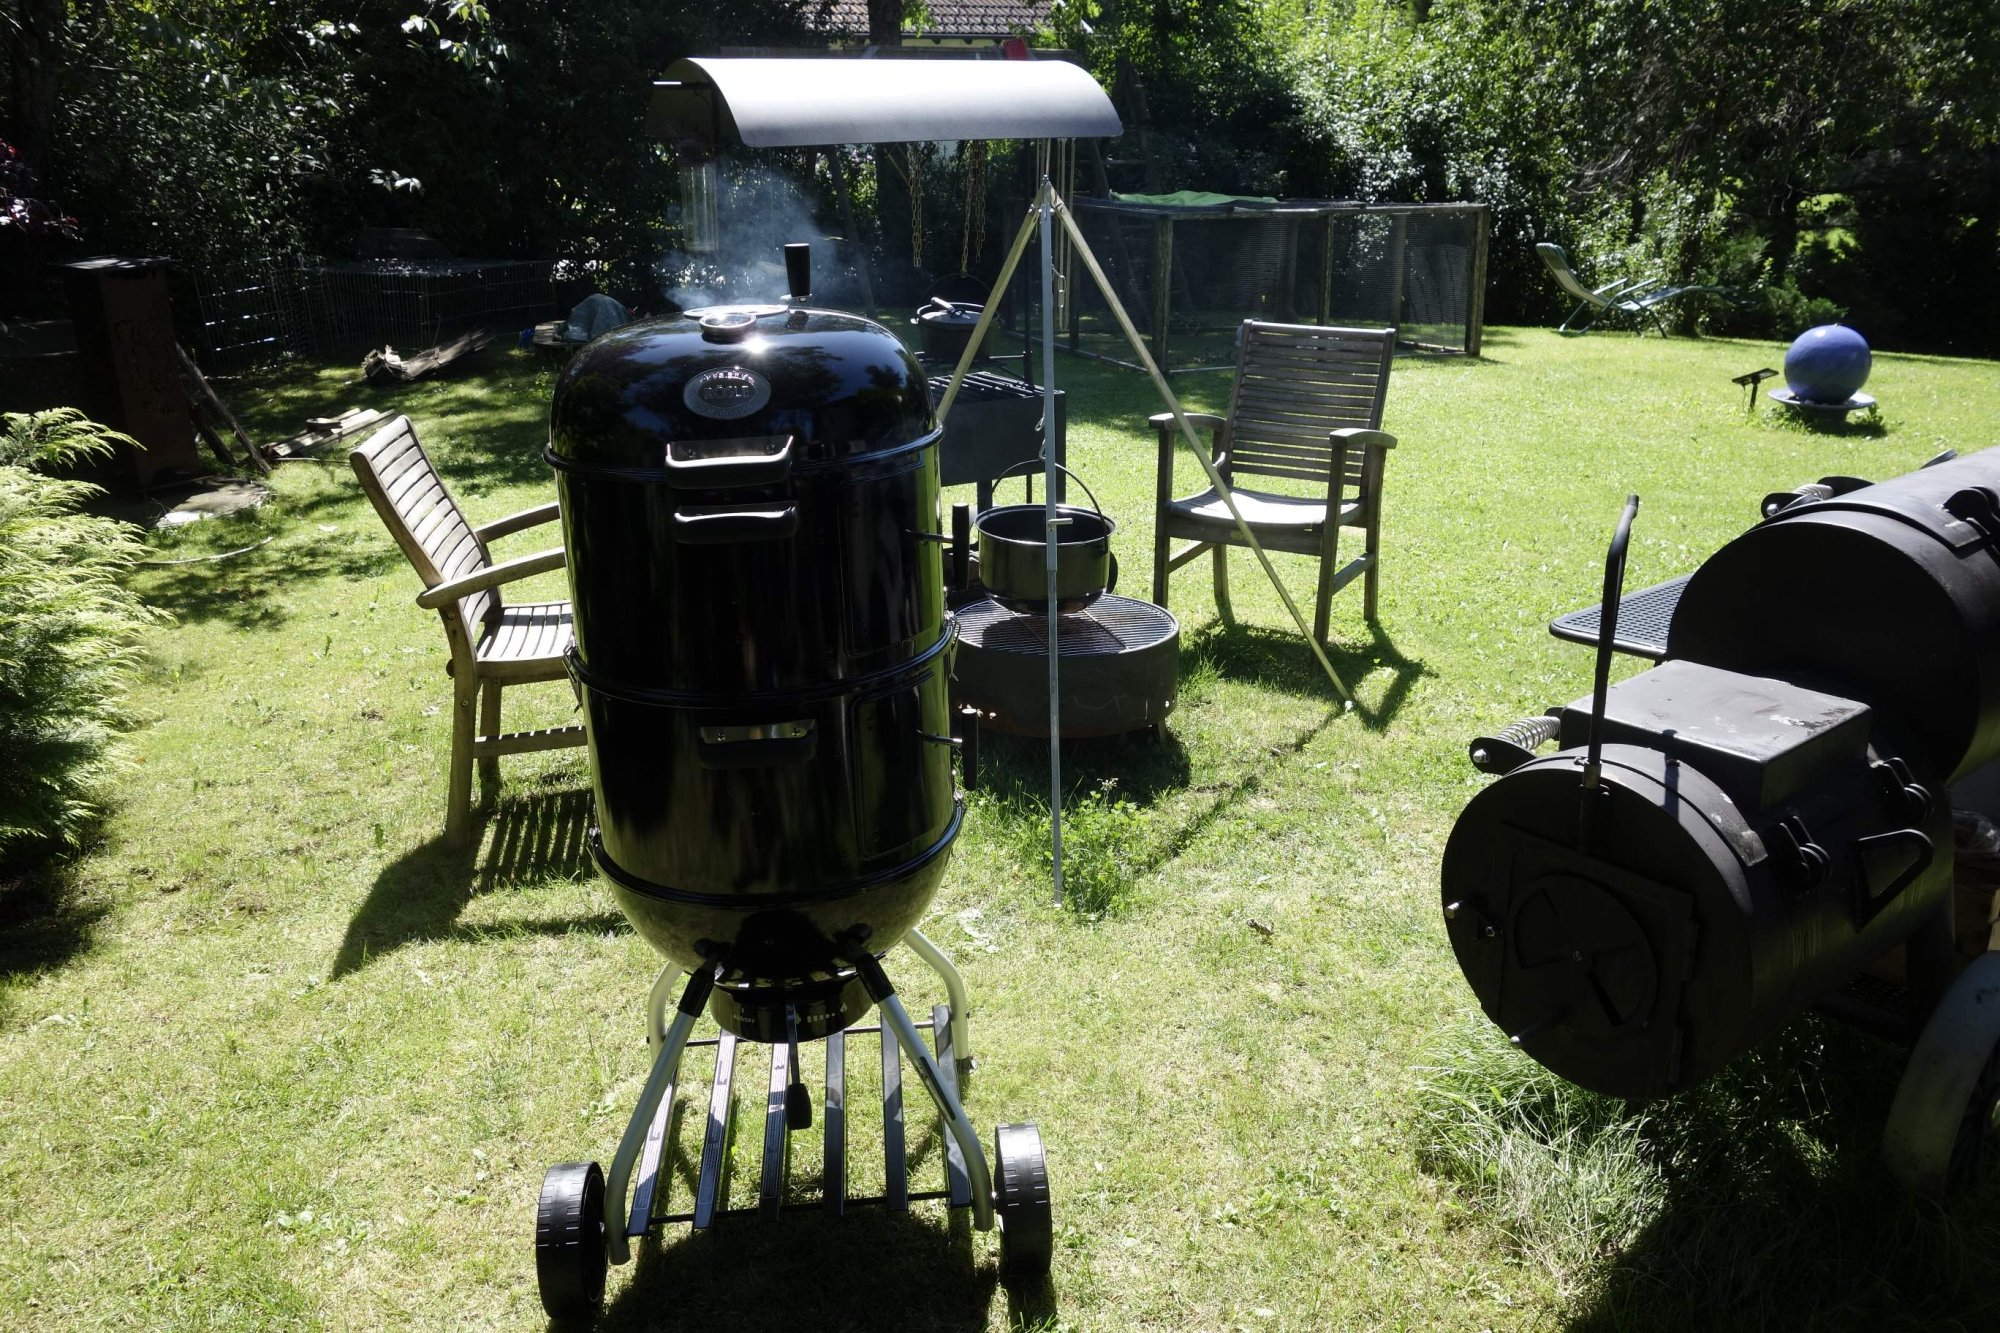 Rösle Holzkohlegrill Test : Rösle grills test testbericht